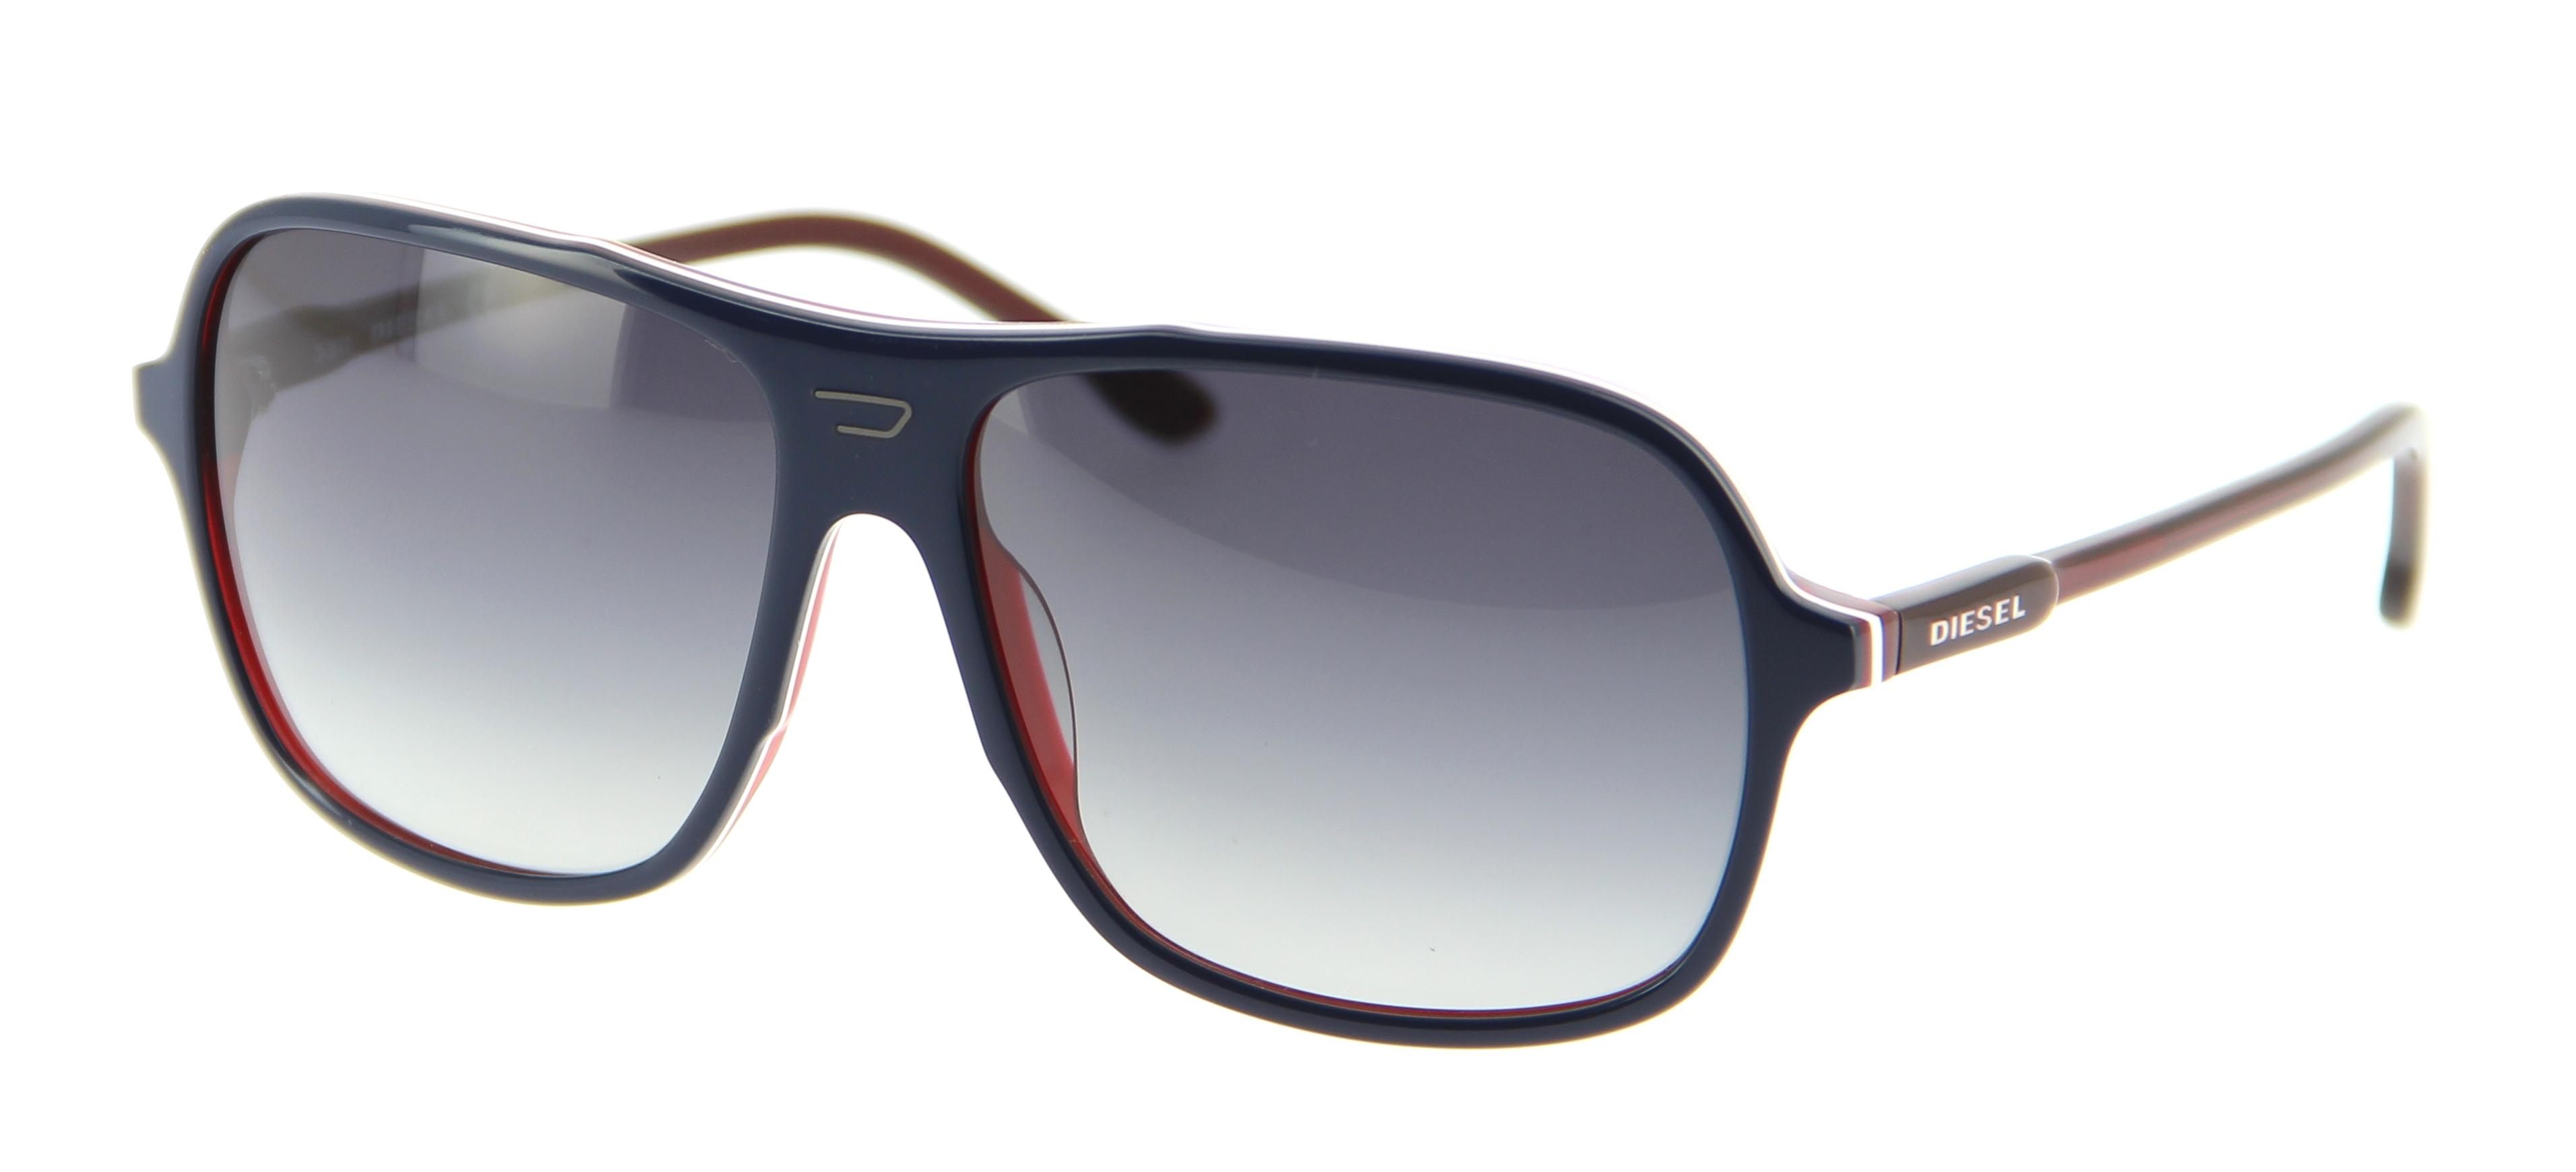 8b2c0212742ae3 diesel lunette homme,DL 5194